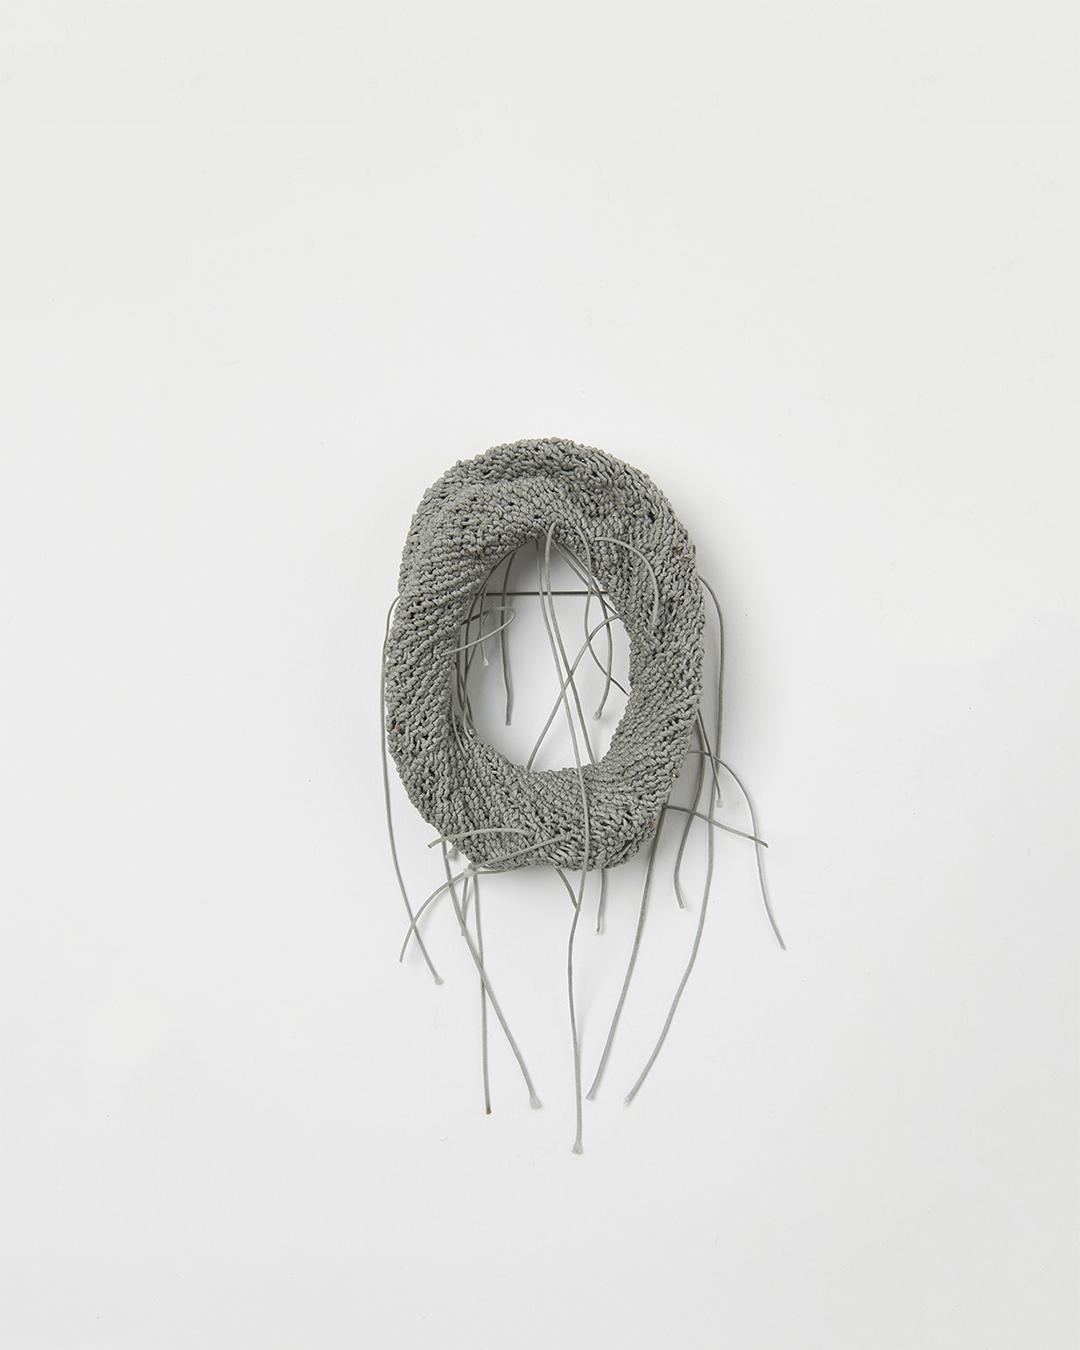 Barbara Schrobenhauser, Grey Net, 2018, brooch; string, silver, stainless steel, 80 x 60 x 20 mm, €1650